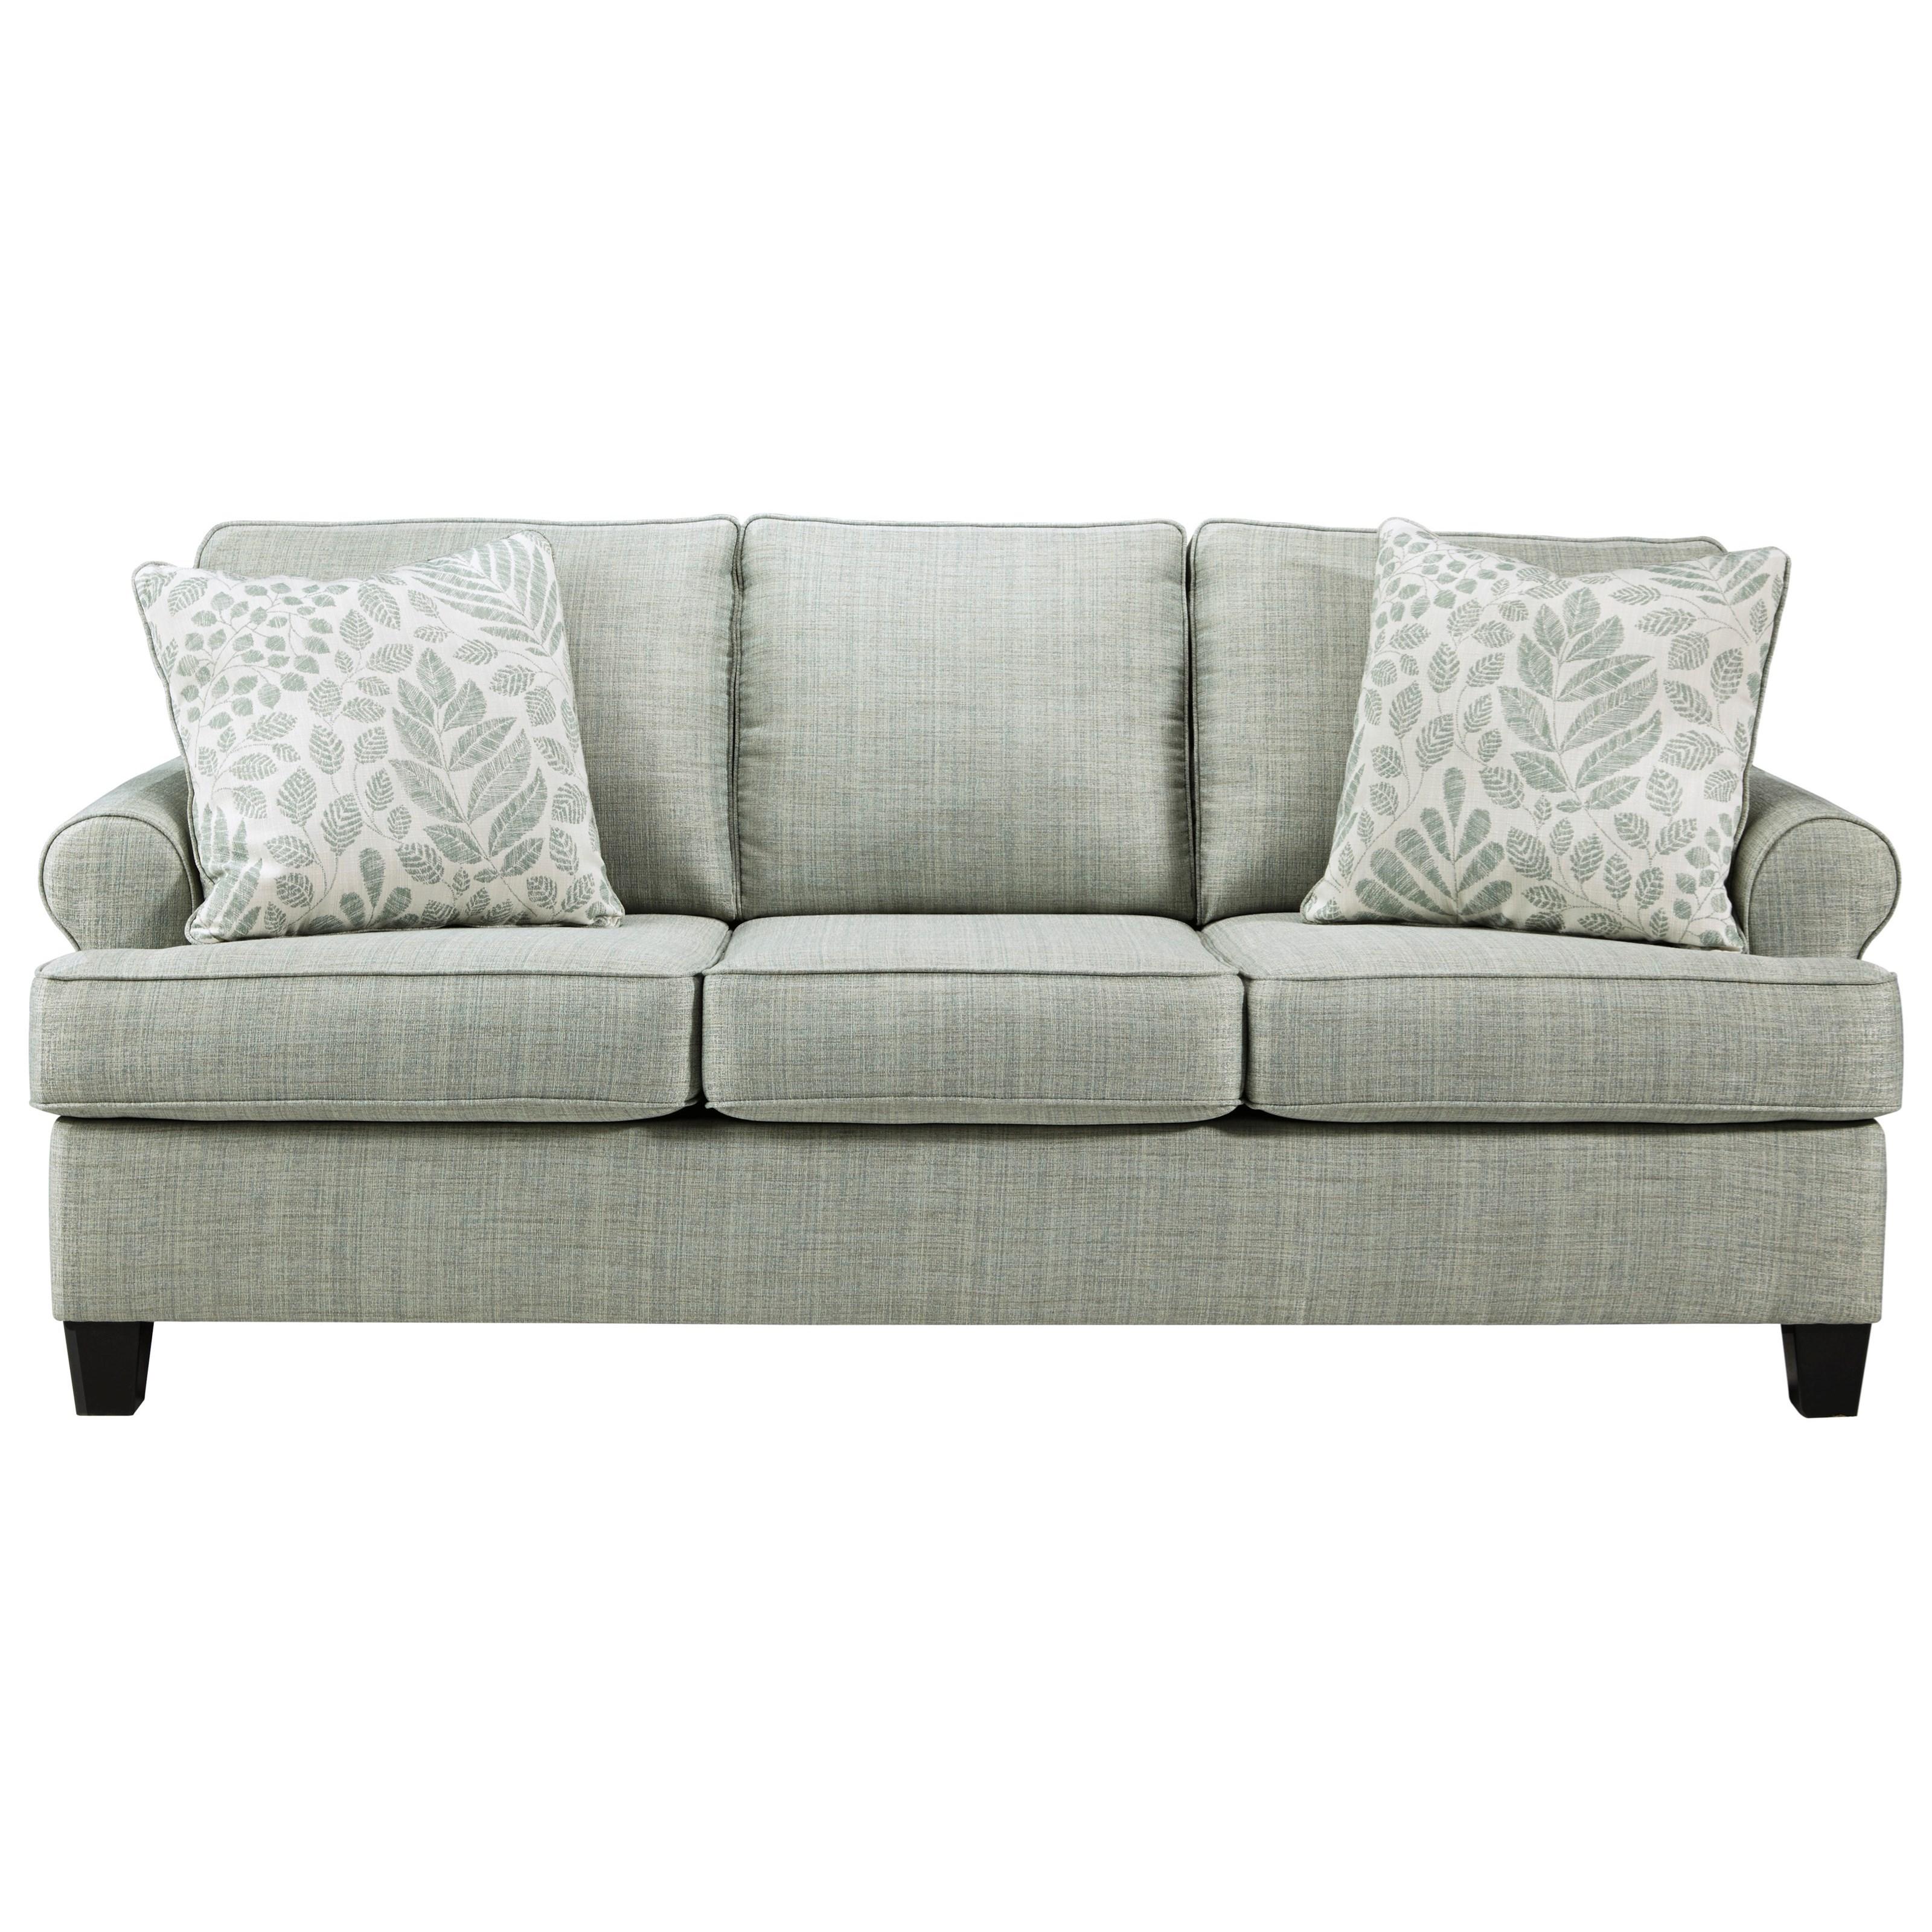 Kilarney Sofa by Ashley Furniture Signature Design at Del Sol Furniture